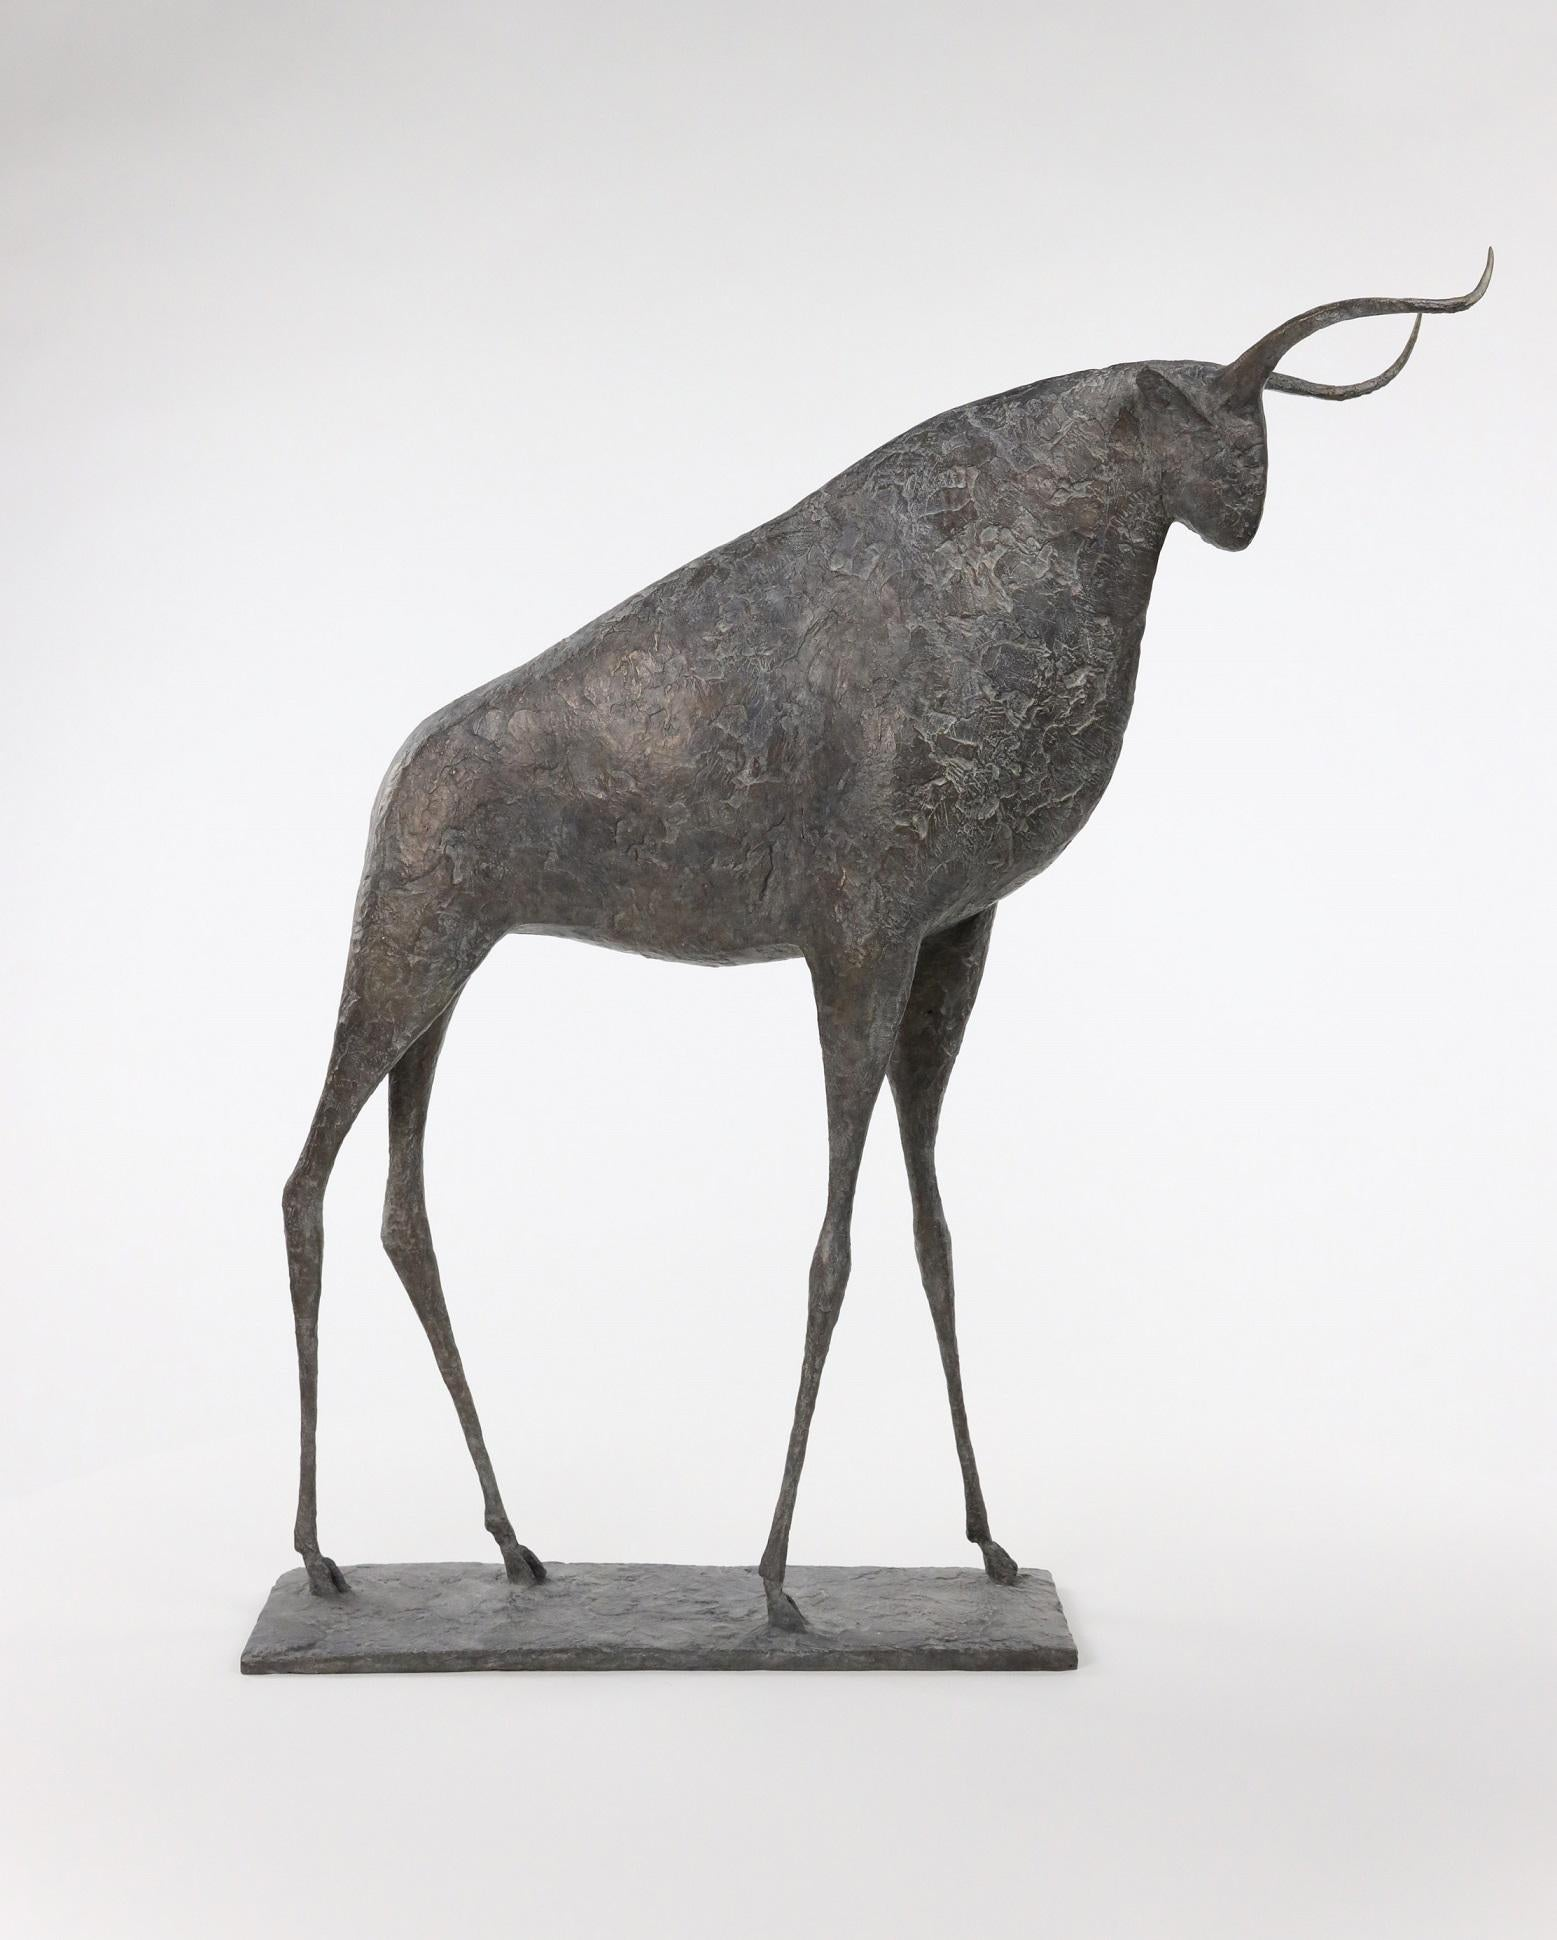 Taureau IX (Bull IX)  - Contemporary Animal Sculpture